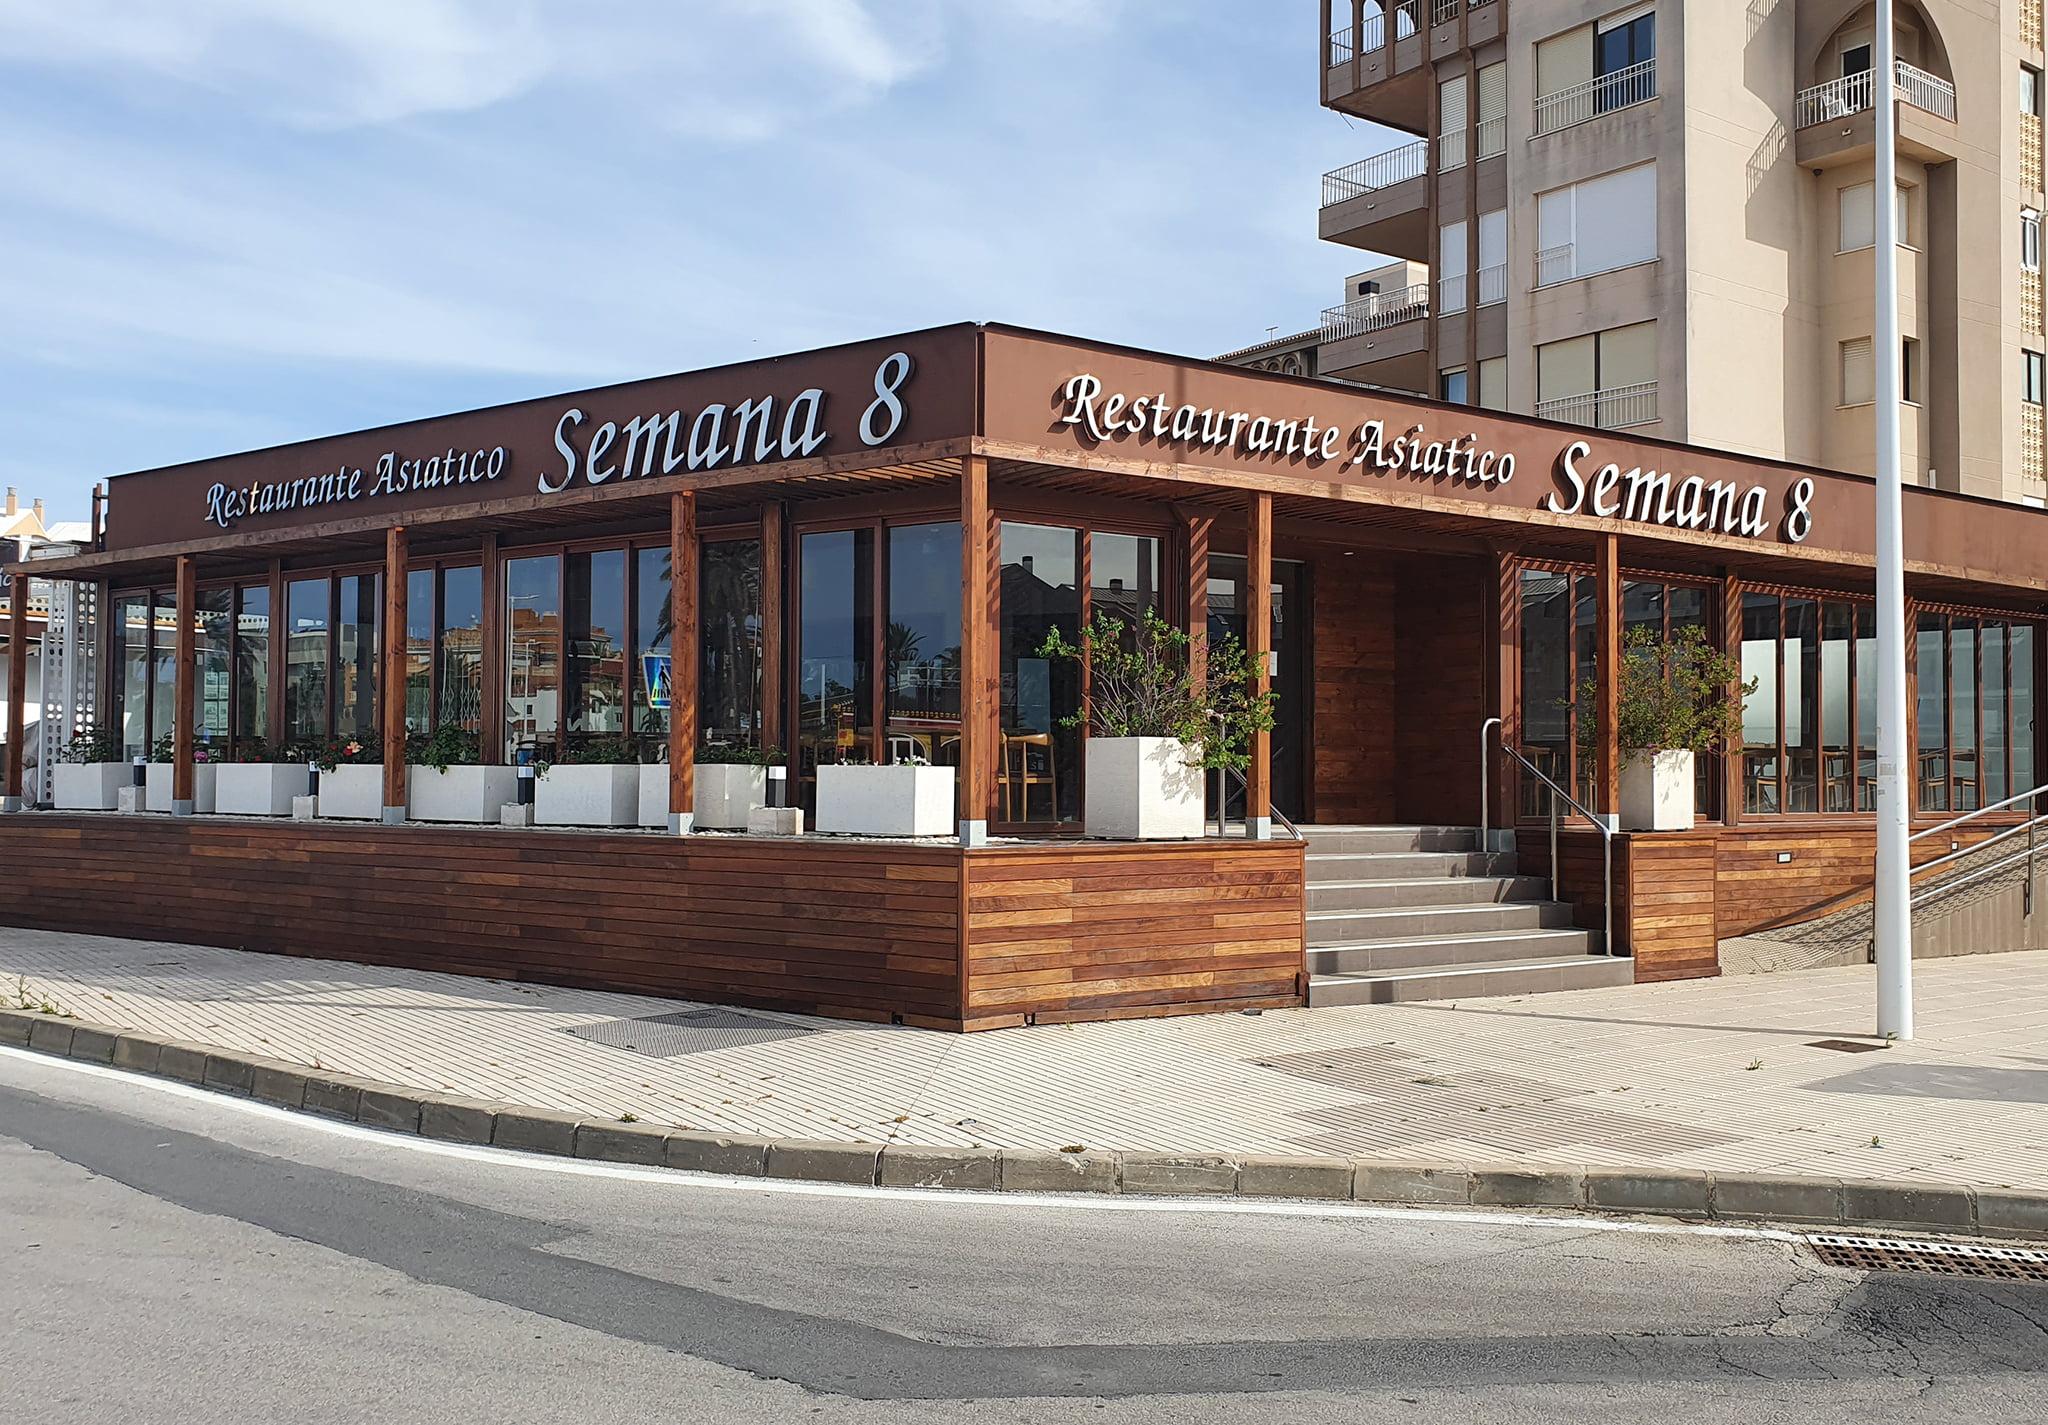 Restaurante asiático en Jávea – Restaurante asiático Semana 8